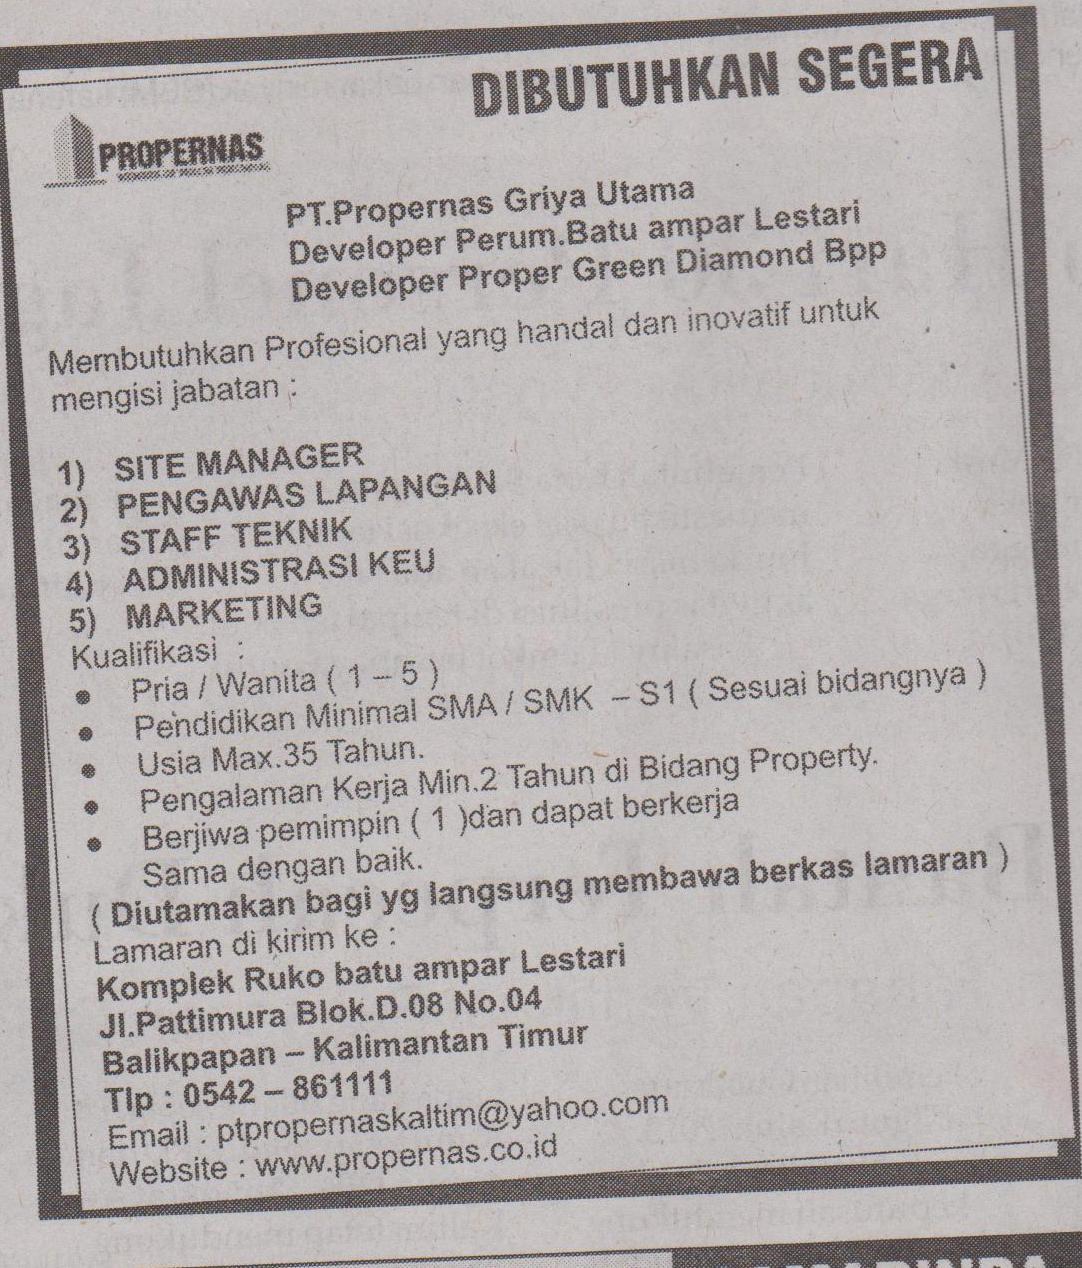 Cpns Solo Bursa Lowongan Kerja Informasi Terbaru Loker Info Lowongan Kerja Kaltim Juni 2013 Pt Propernas Griya Utama